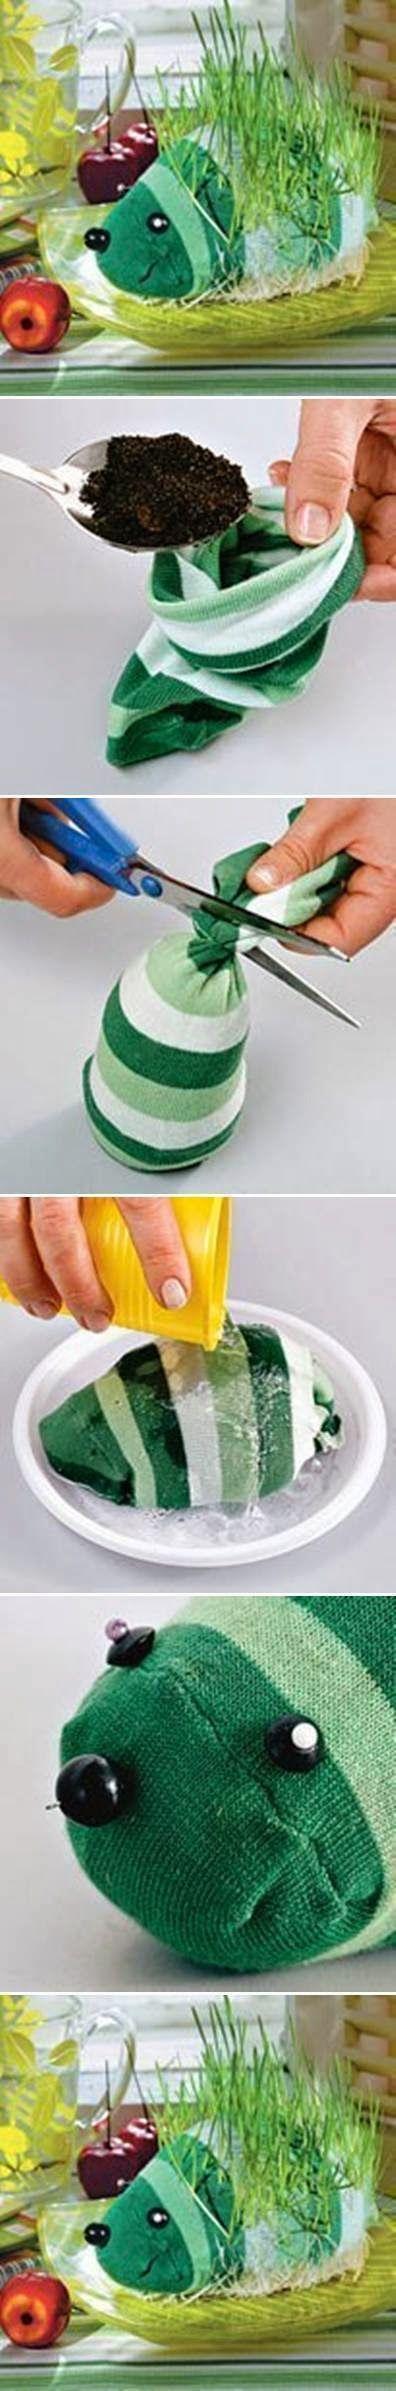 DIY : Sock Growing Grass Hedgehog